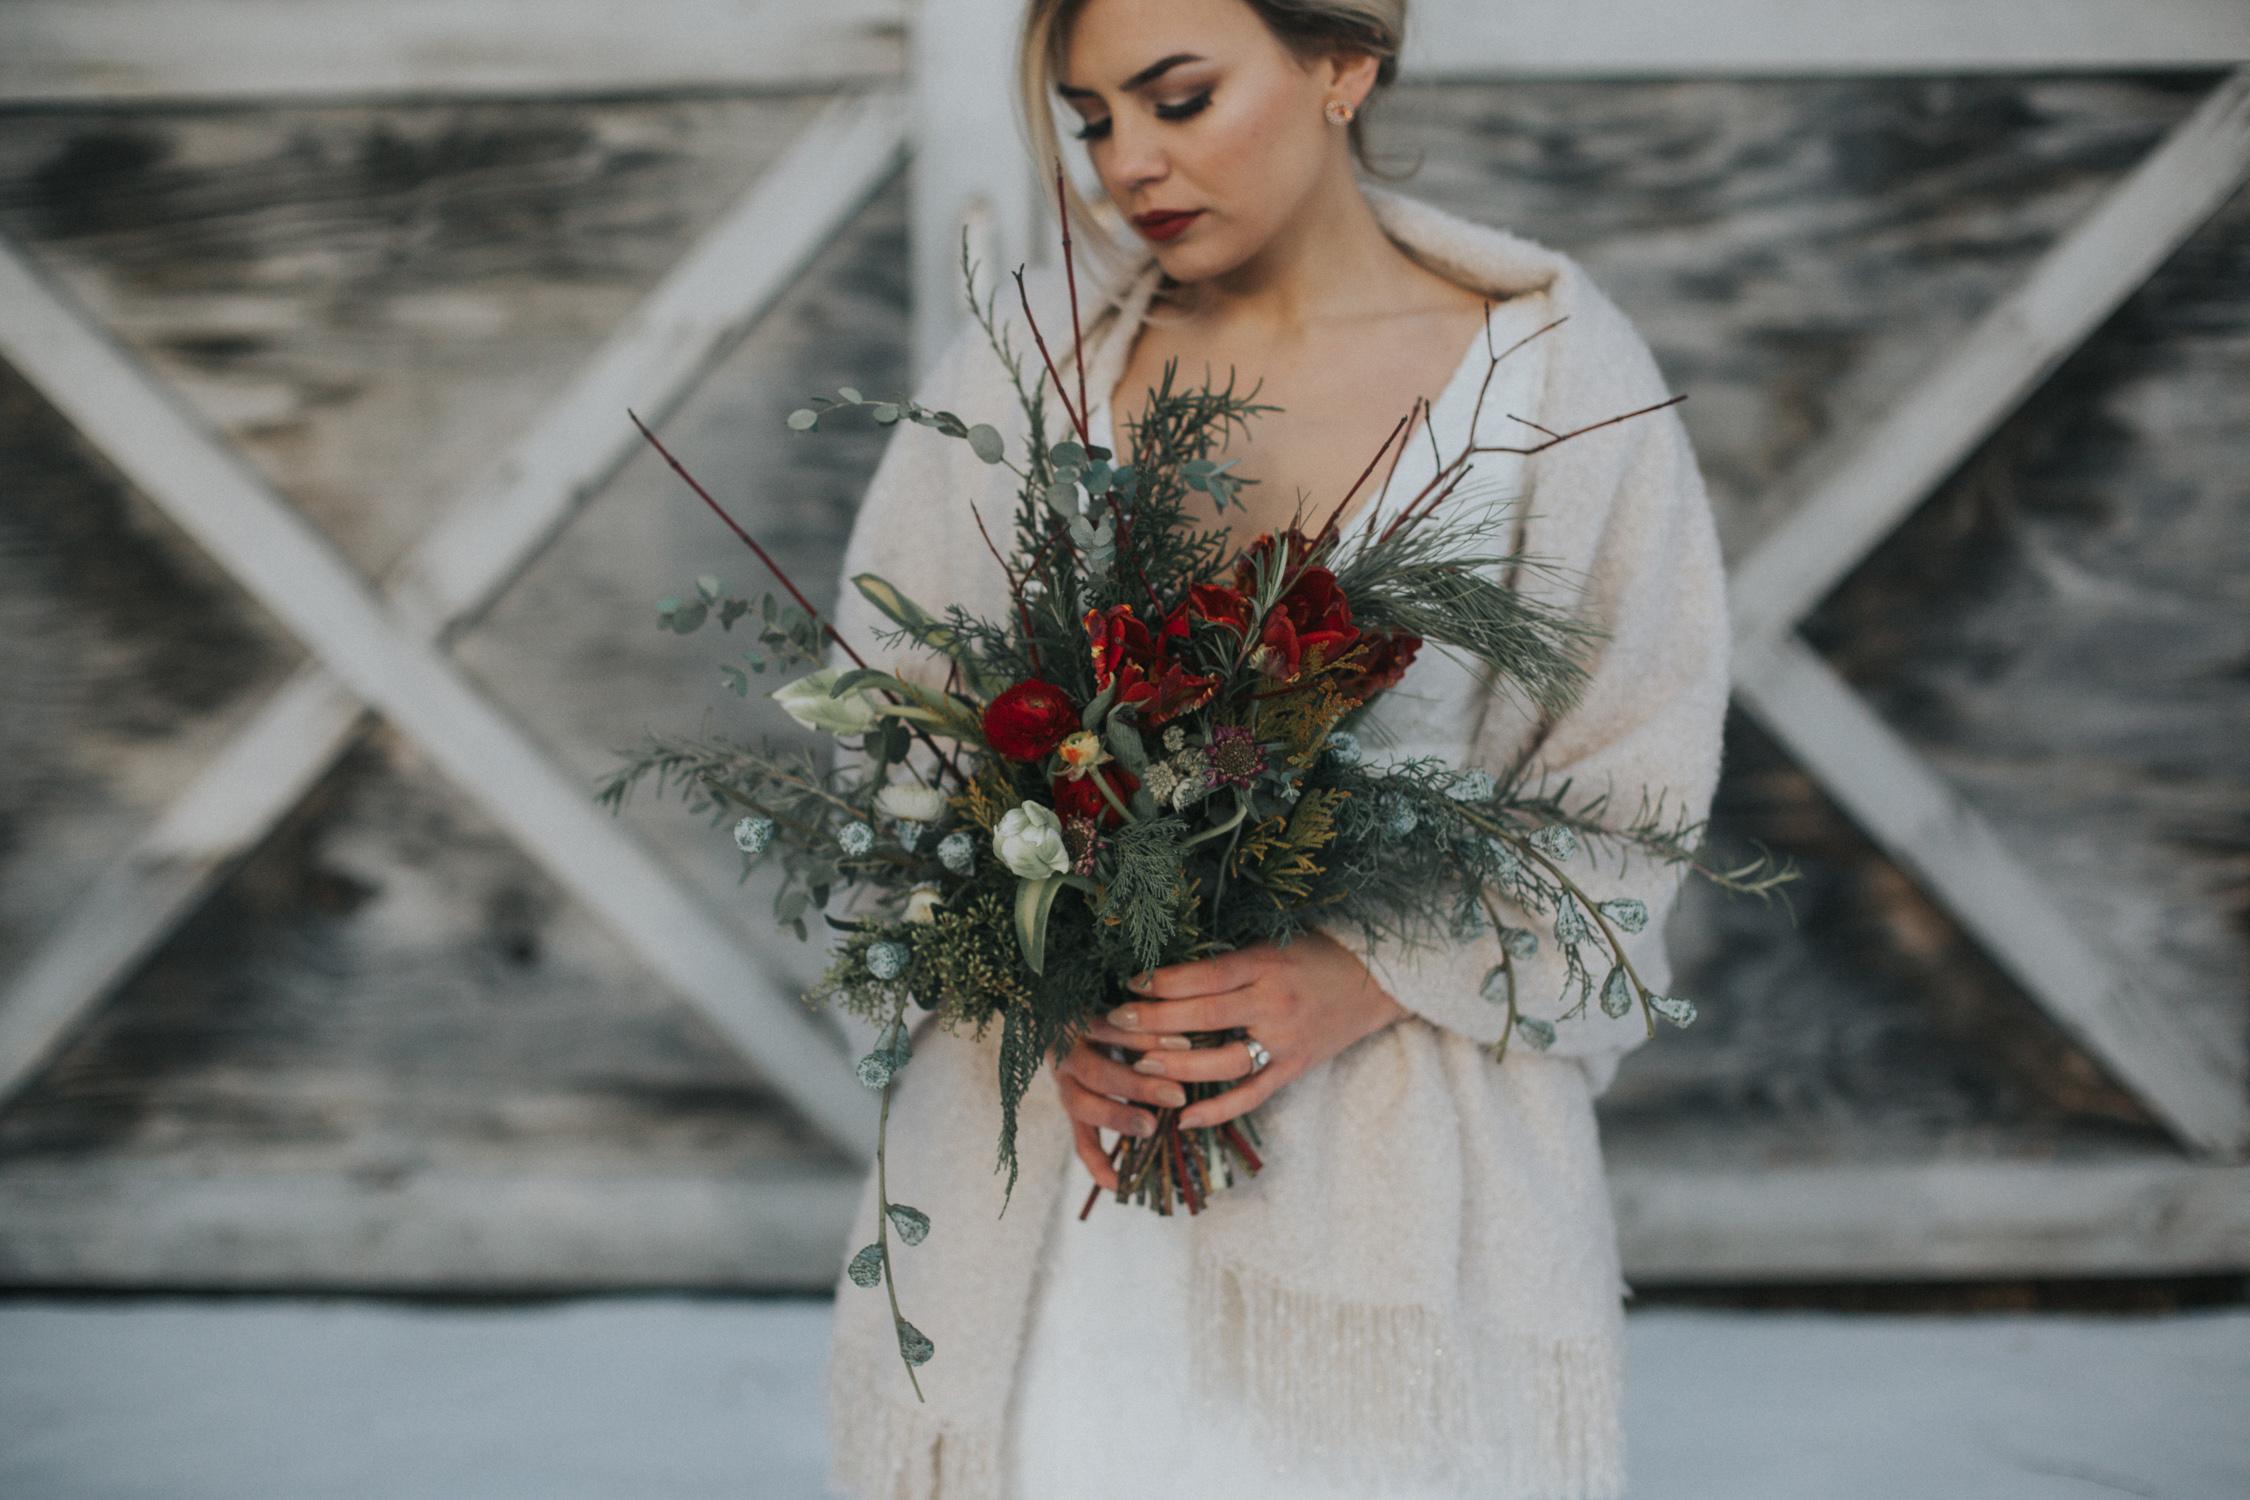 mnd_farm_winter_wedding_010.jpg